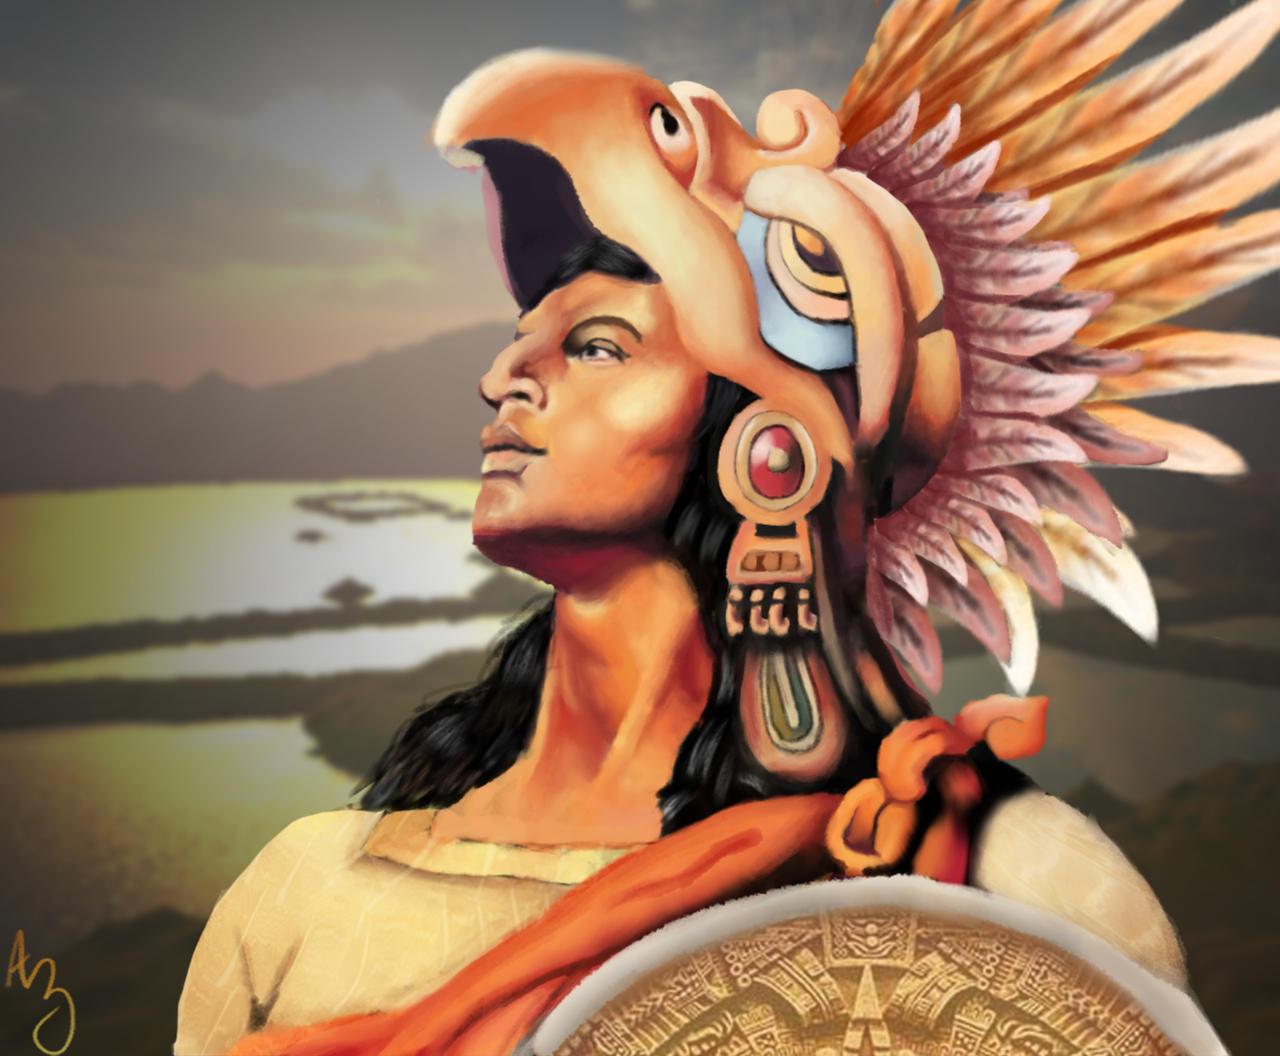 Aztec Eagle Warrior Pictures Images amp Photos  Photobucket